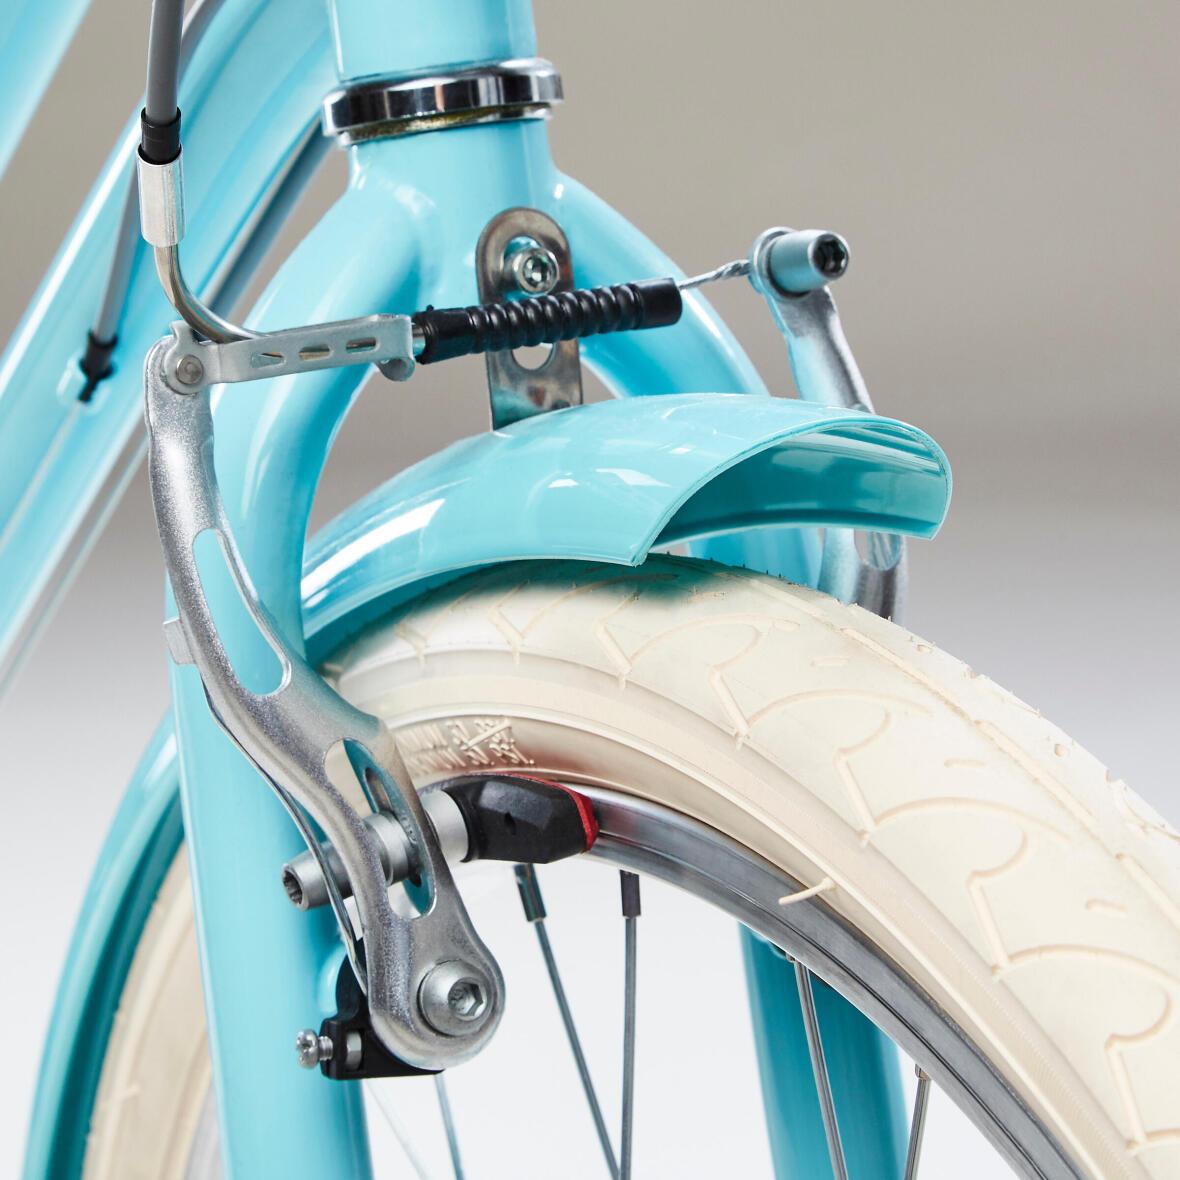 V-brake-brake-levers-kids-city-bike